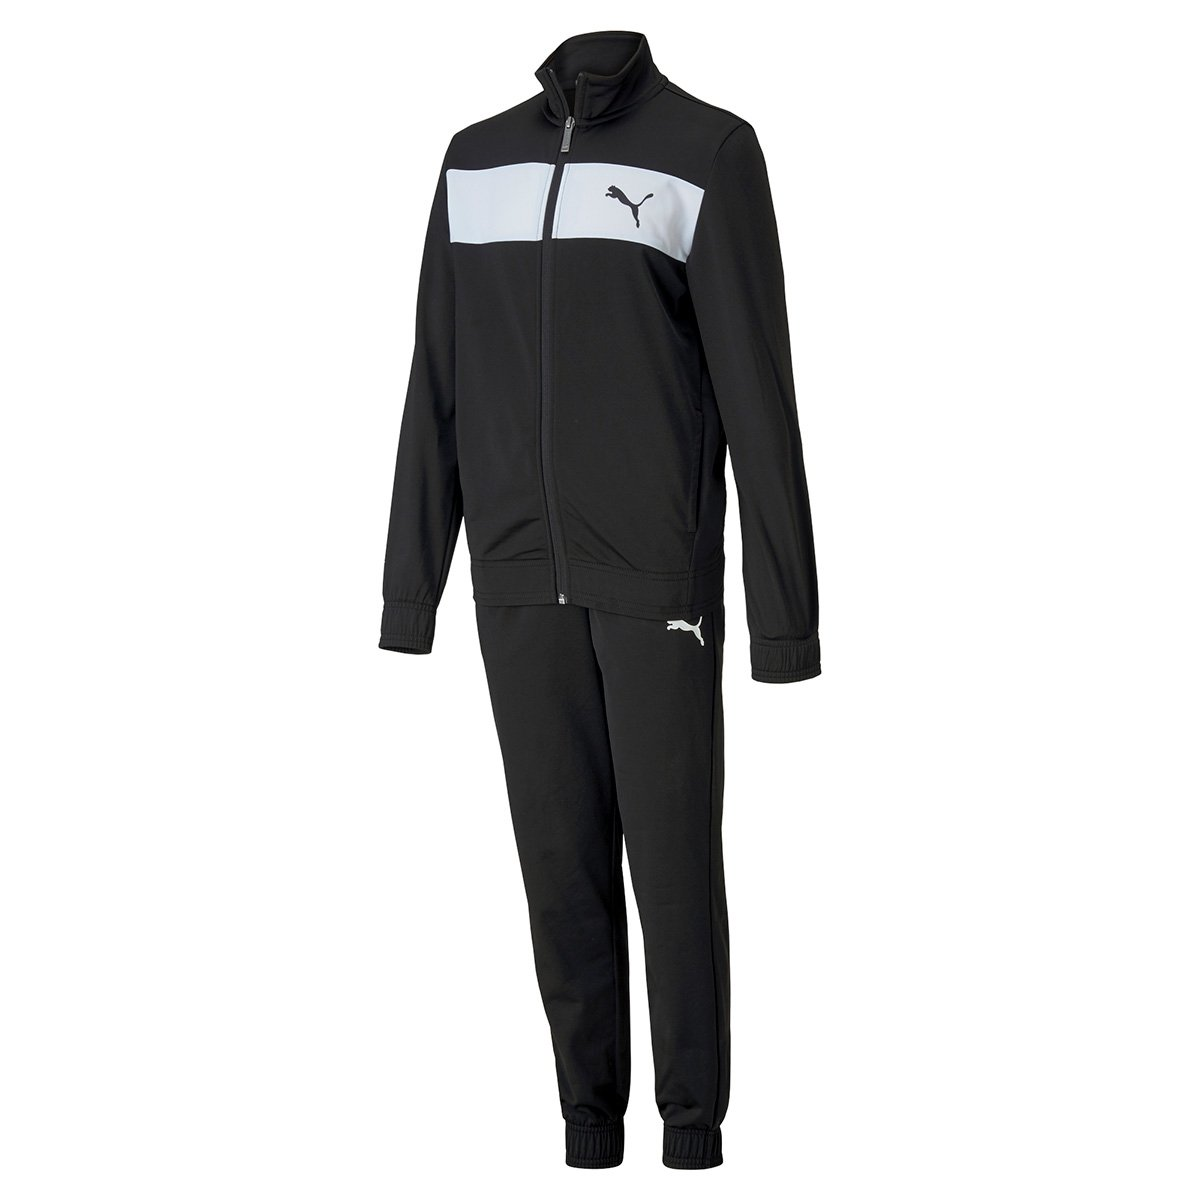 Agasalho Infantil Puma Poly Suit CL B Masculino